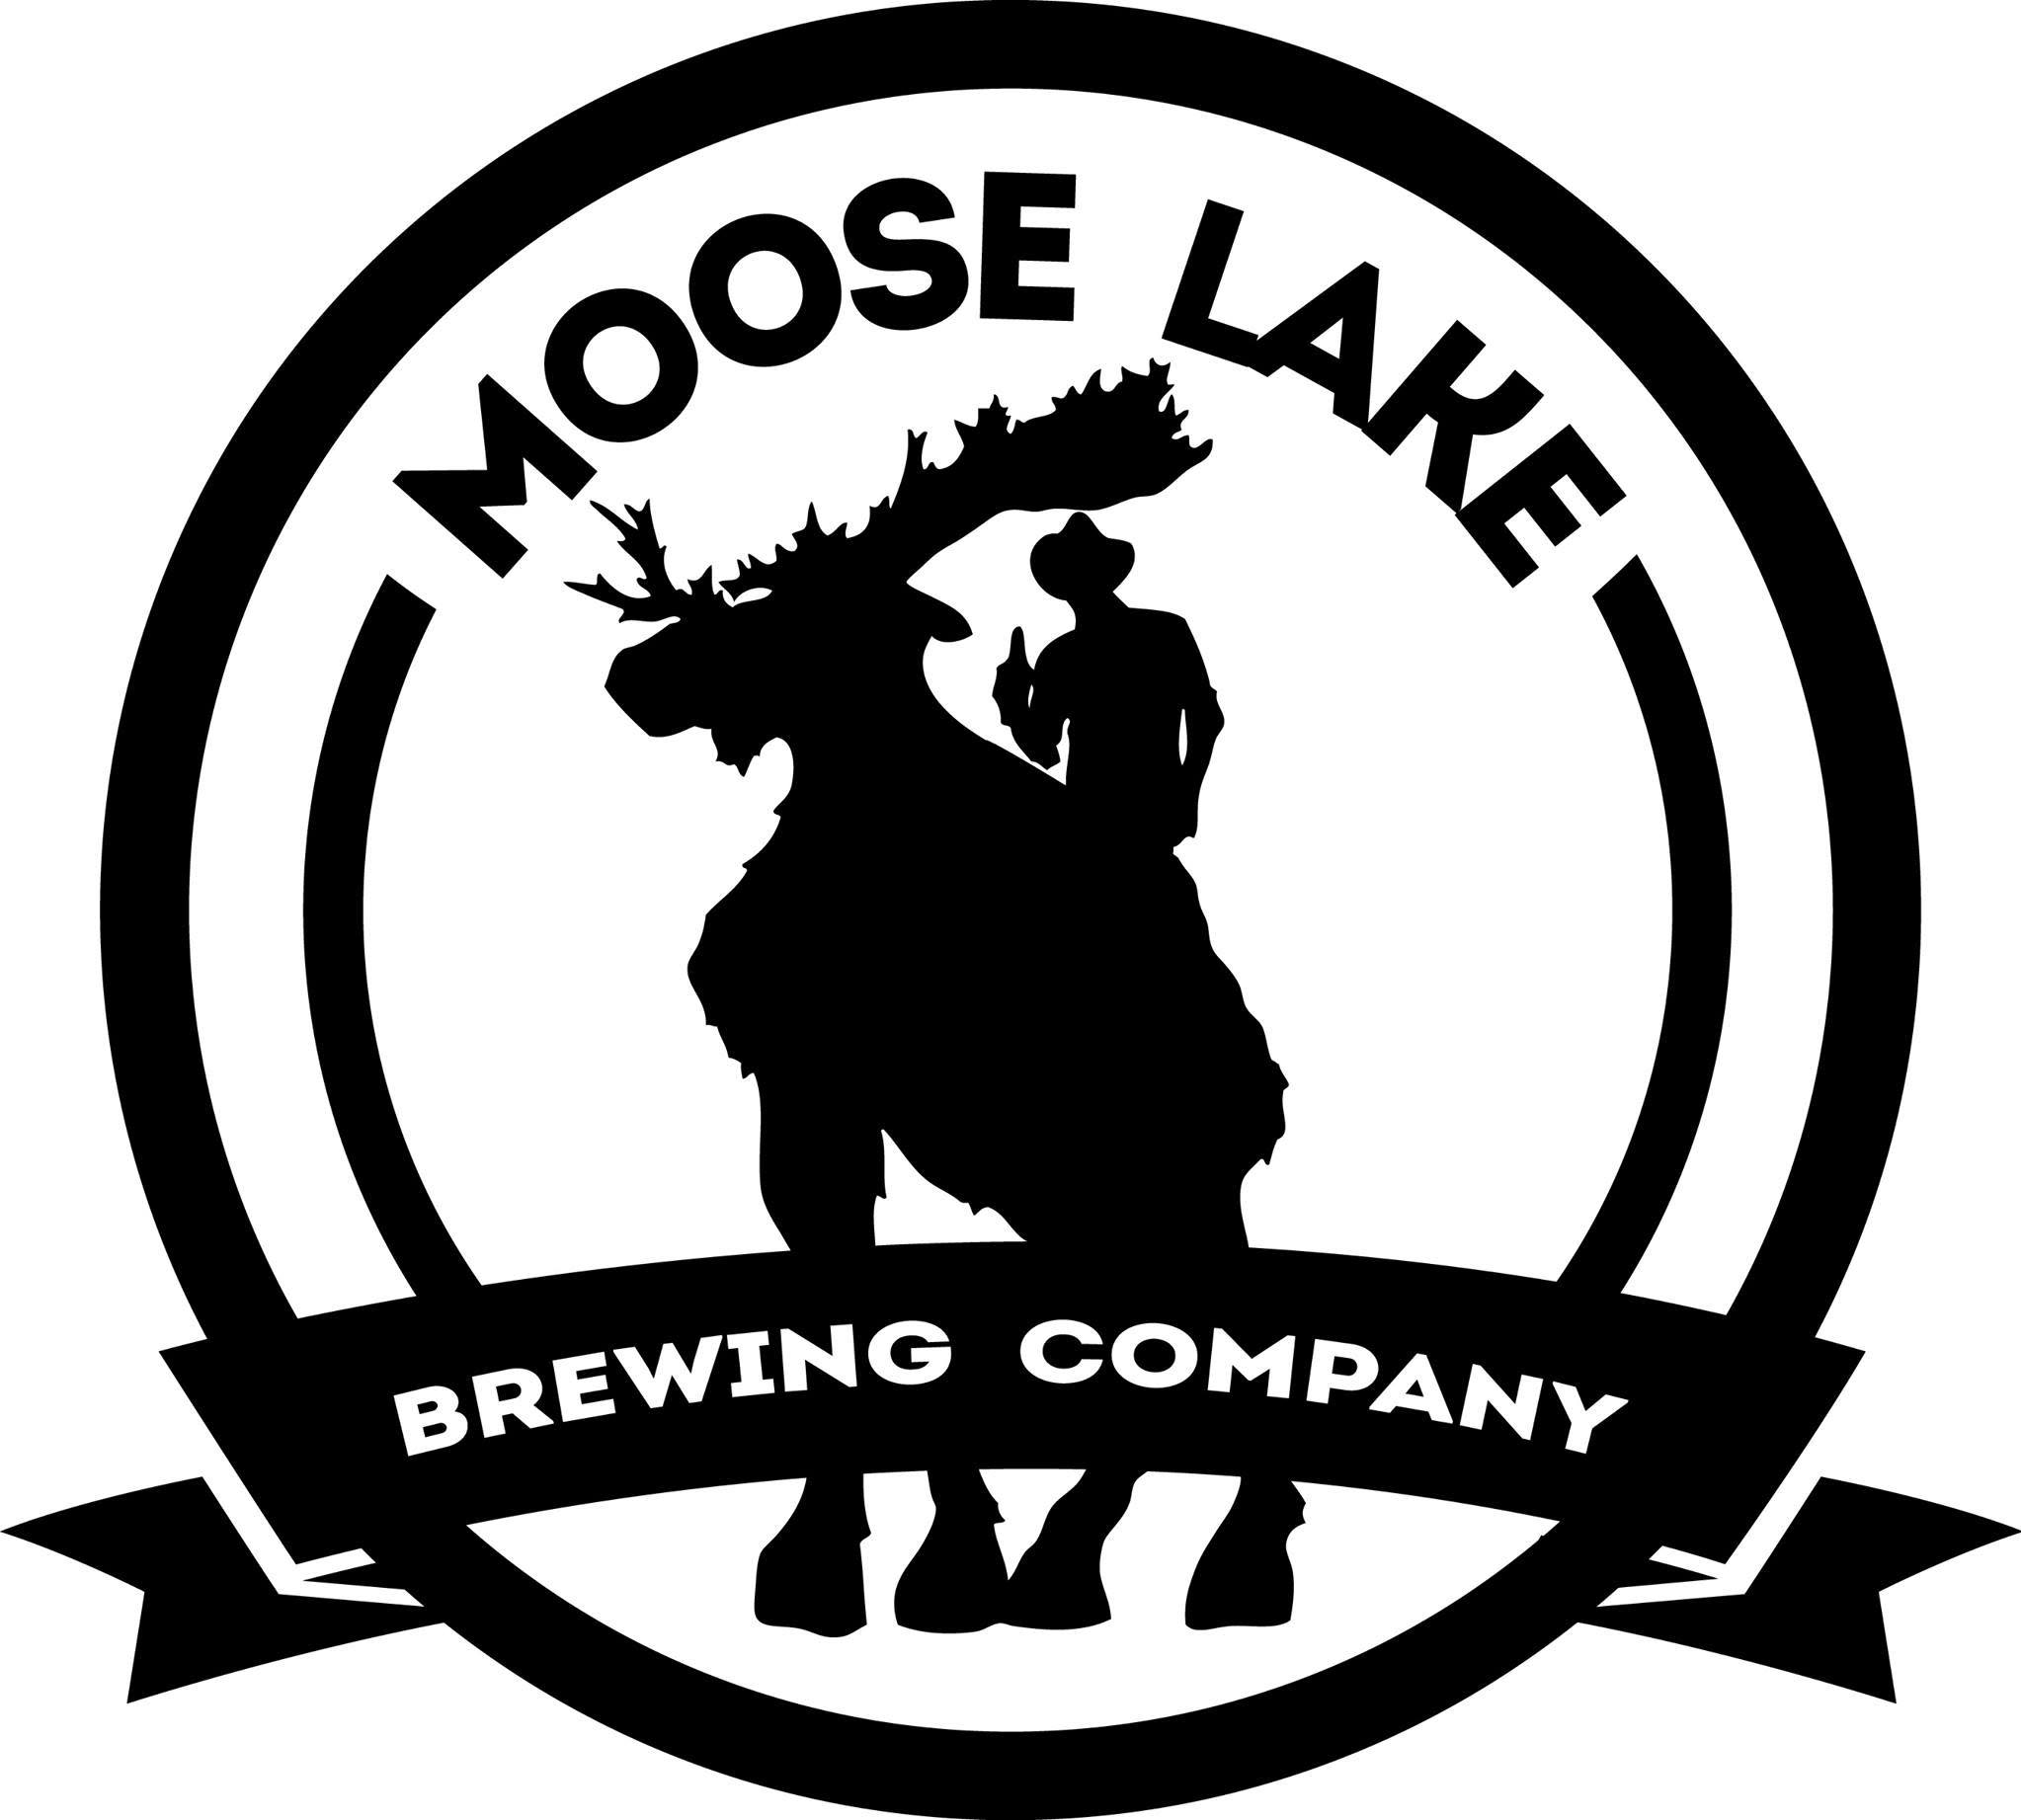 Moose Lake Brewing Company Logo